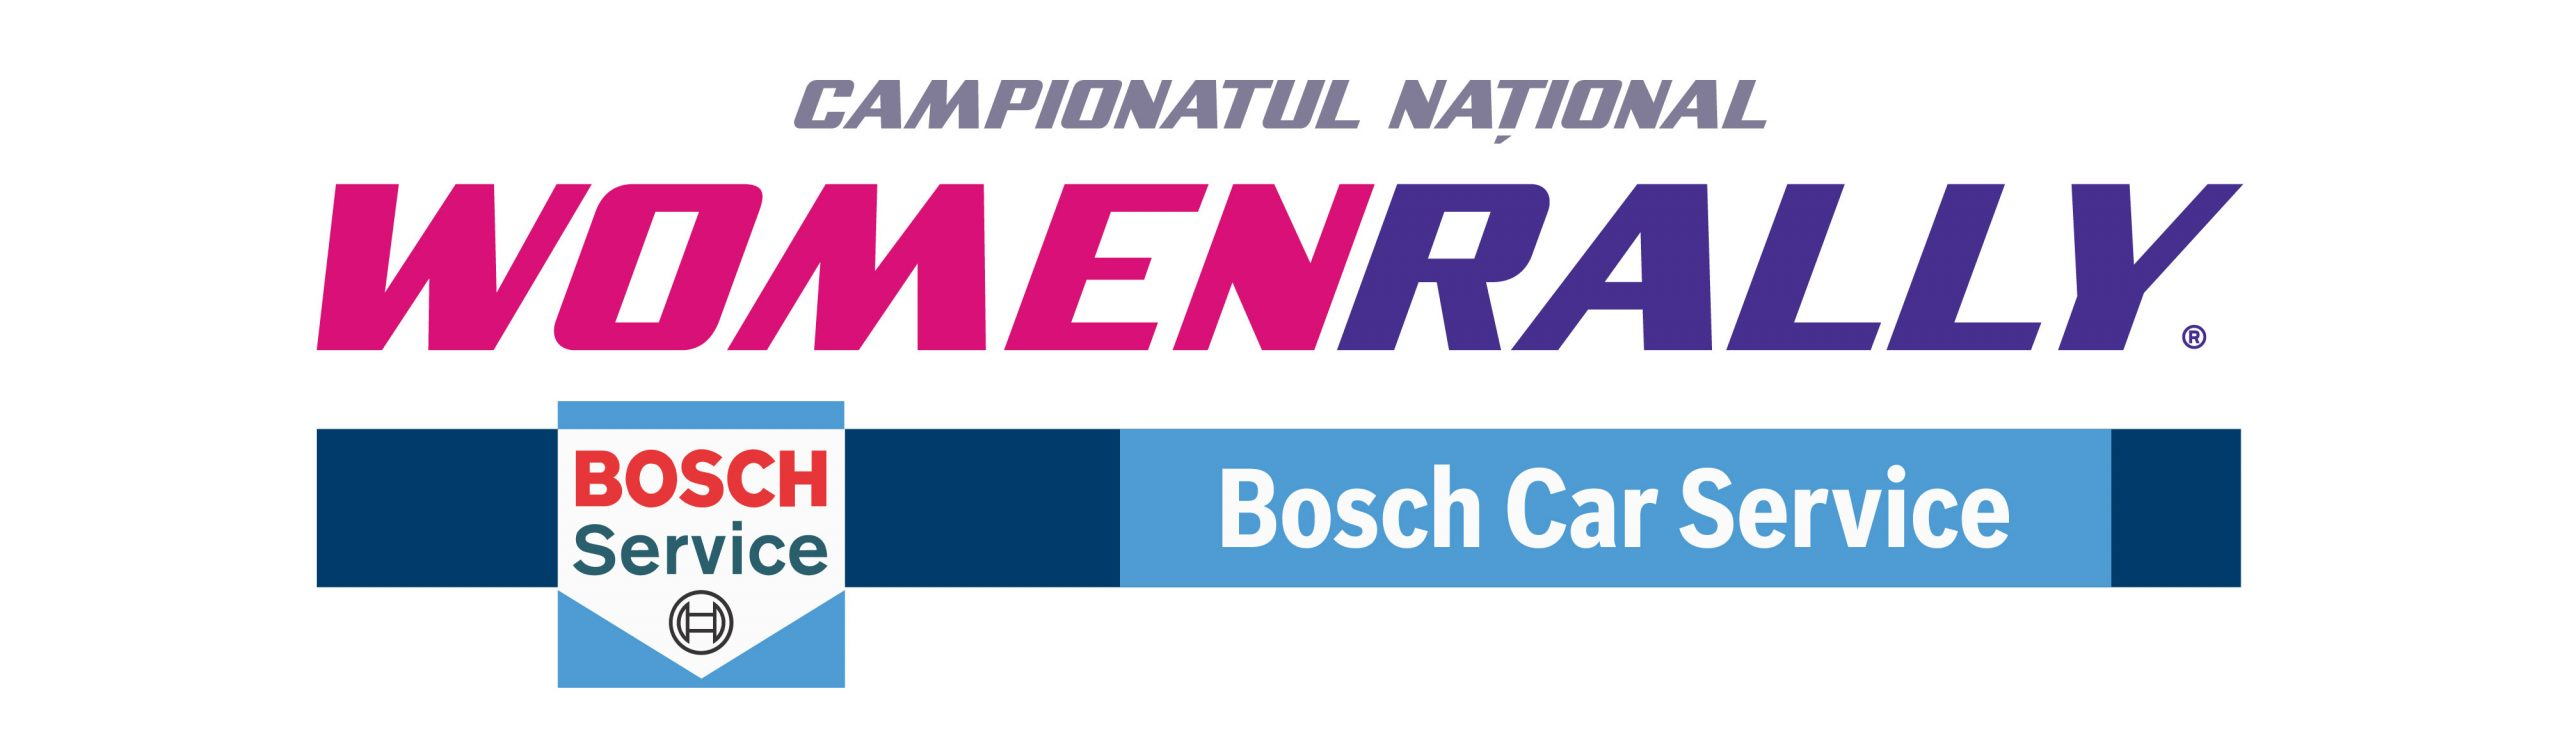 Campionatul Național Women Rally Bosch Car Service